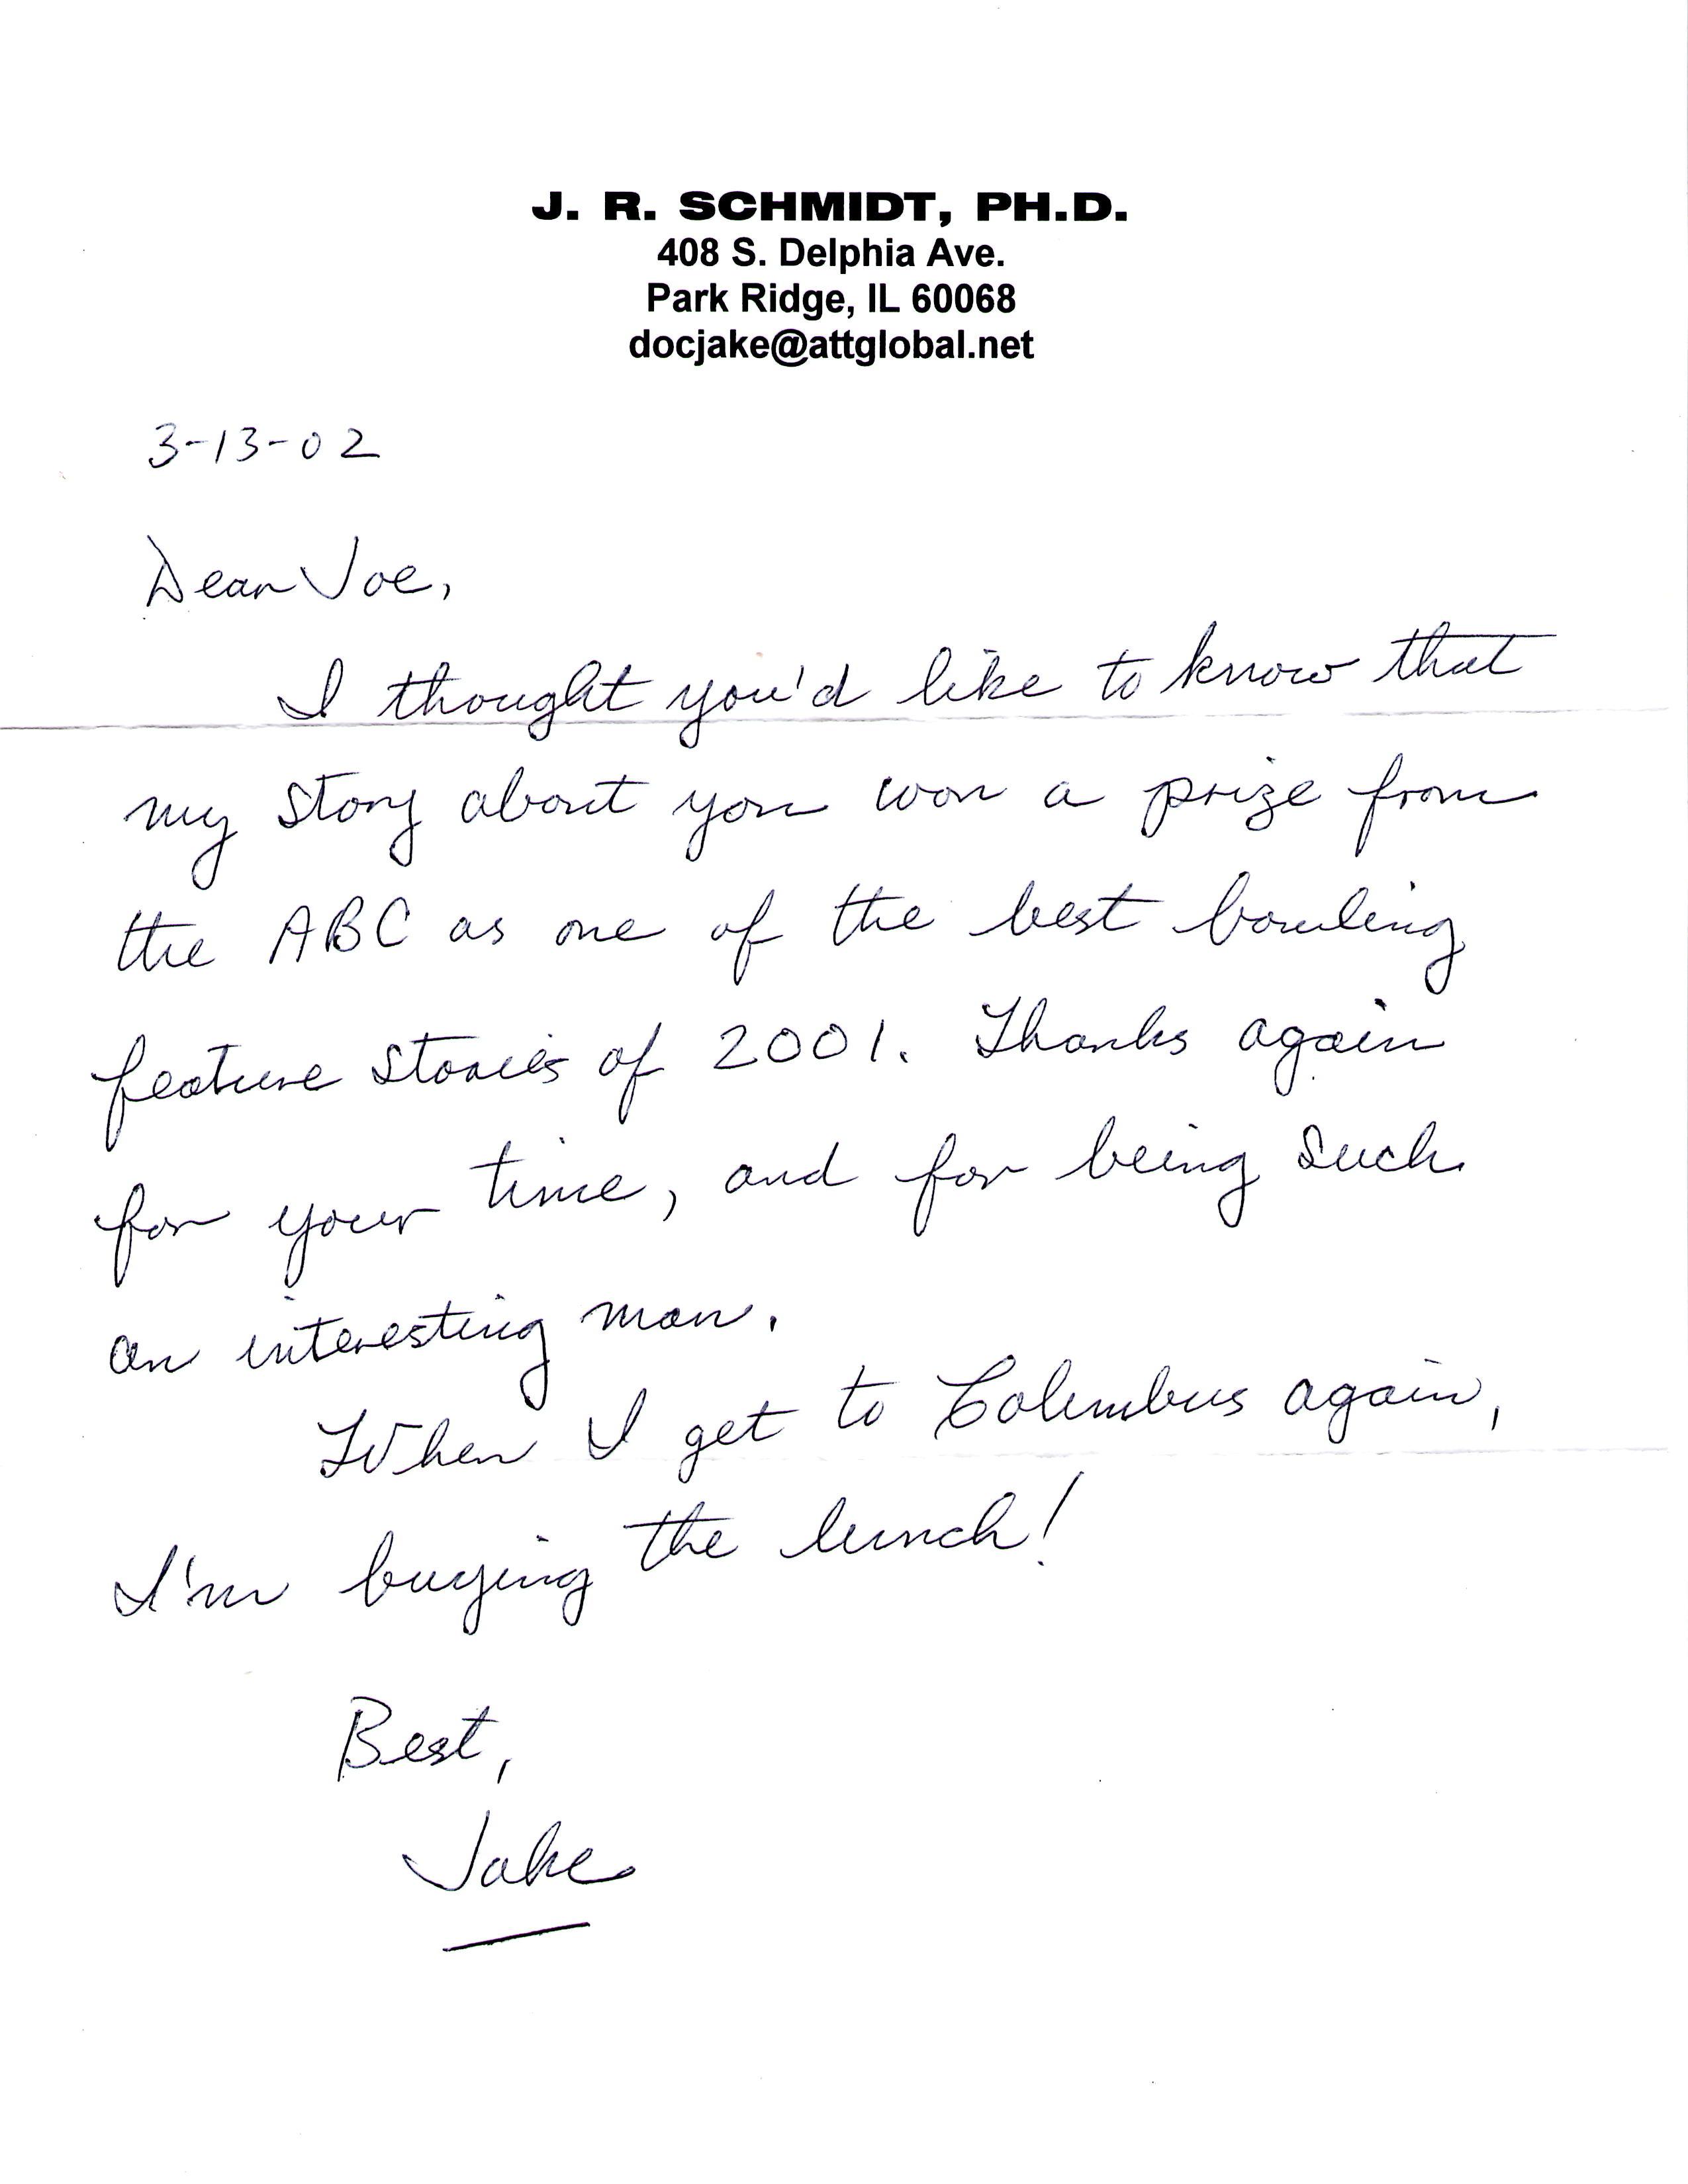 J R Schmidt letter